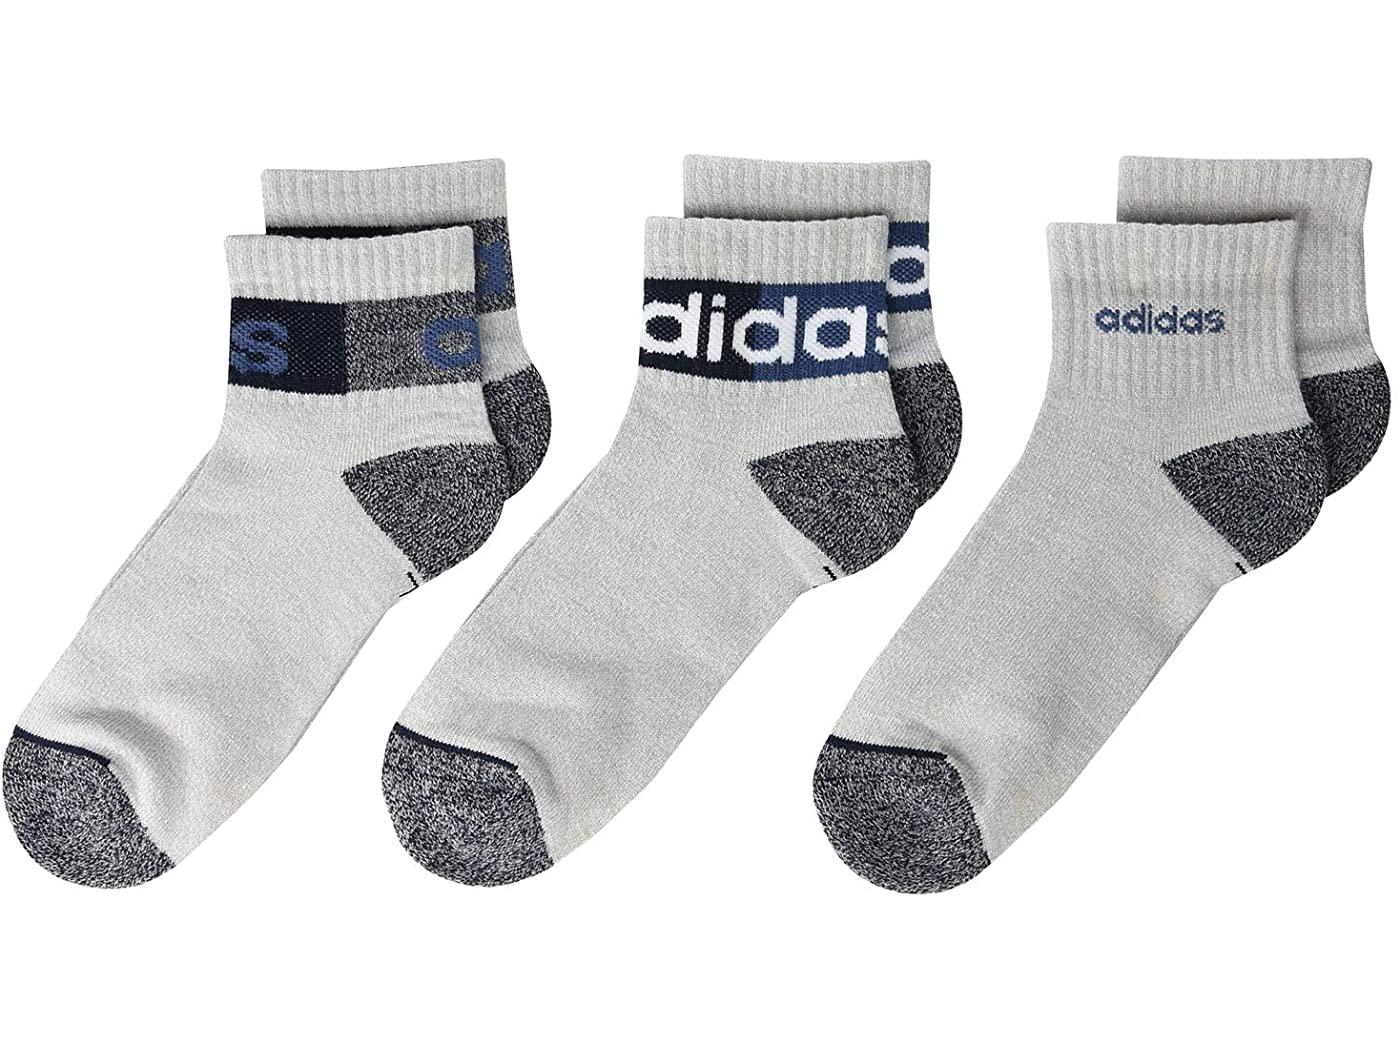 6-Pair adidas Kids' Boys/Girls Blocked Linear Quarter Socks (various colors, medium or large) $3.95 + Free Shipping w/ Prime or on $25+